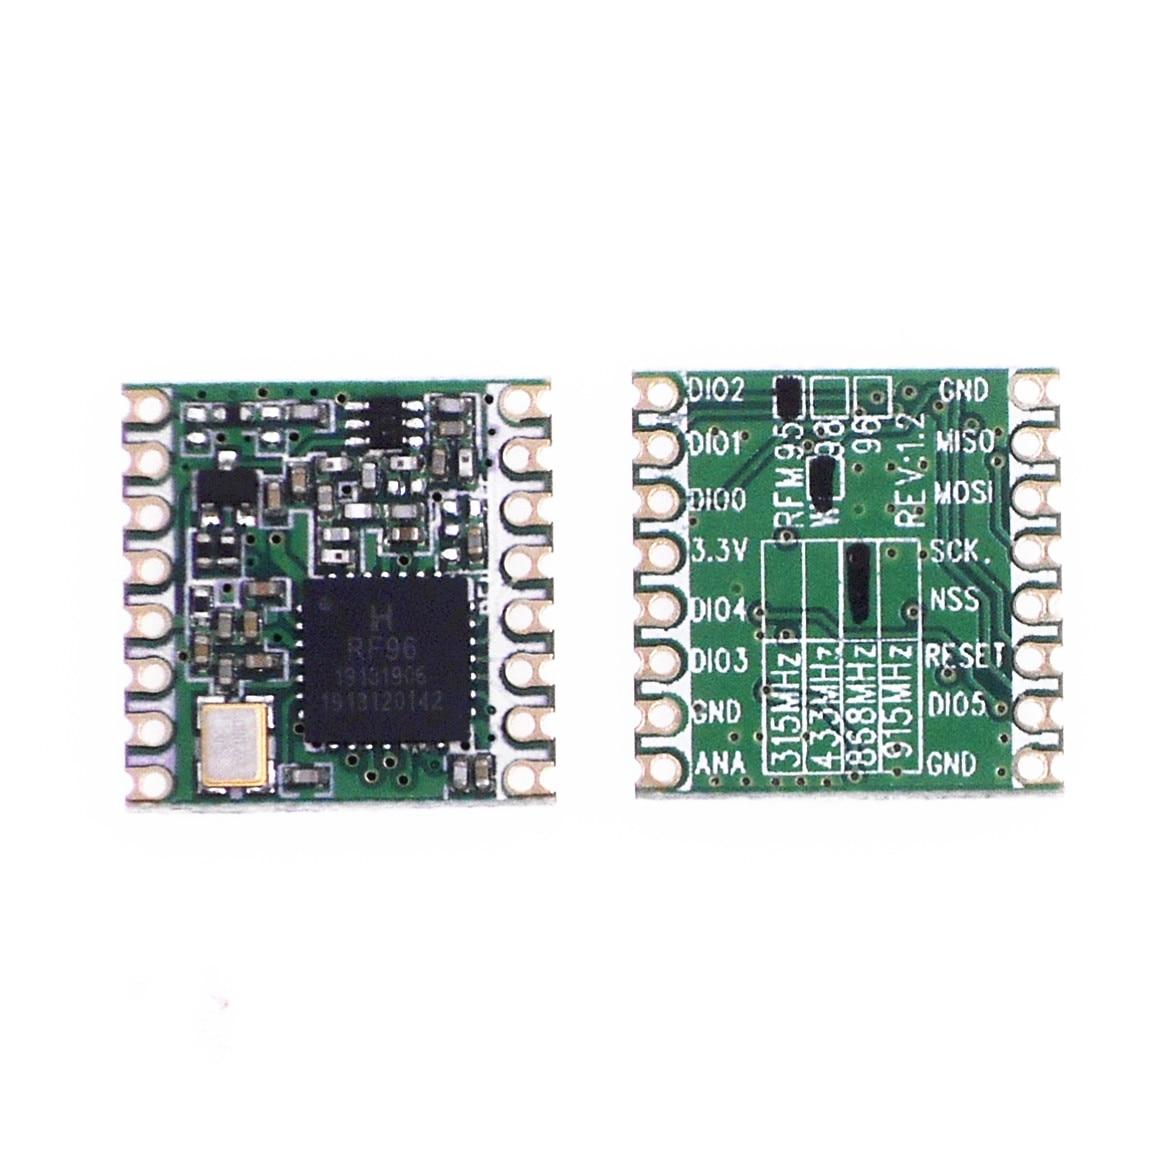 free shipping 2pcs/lot RFM95W 20dBm 100mW 868Mhz 915Mhz DSSS spread spectrum wireless transceiver module SX1276 lora module